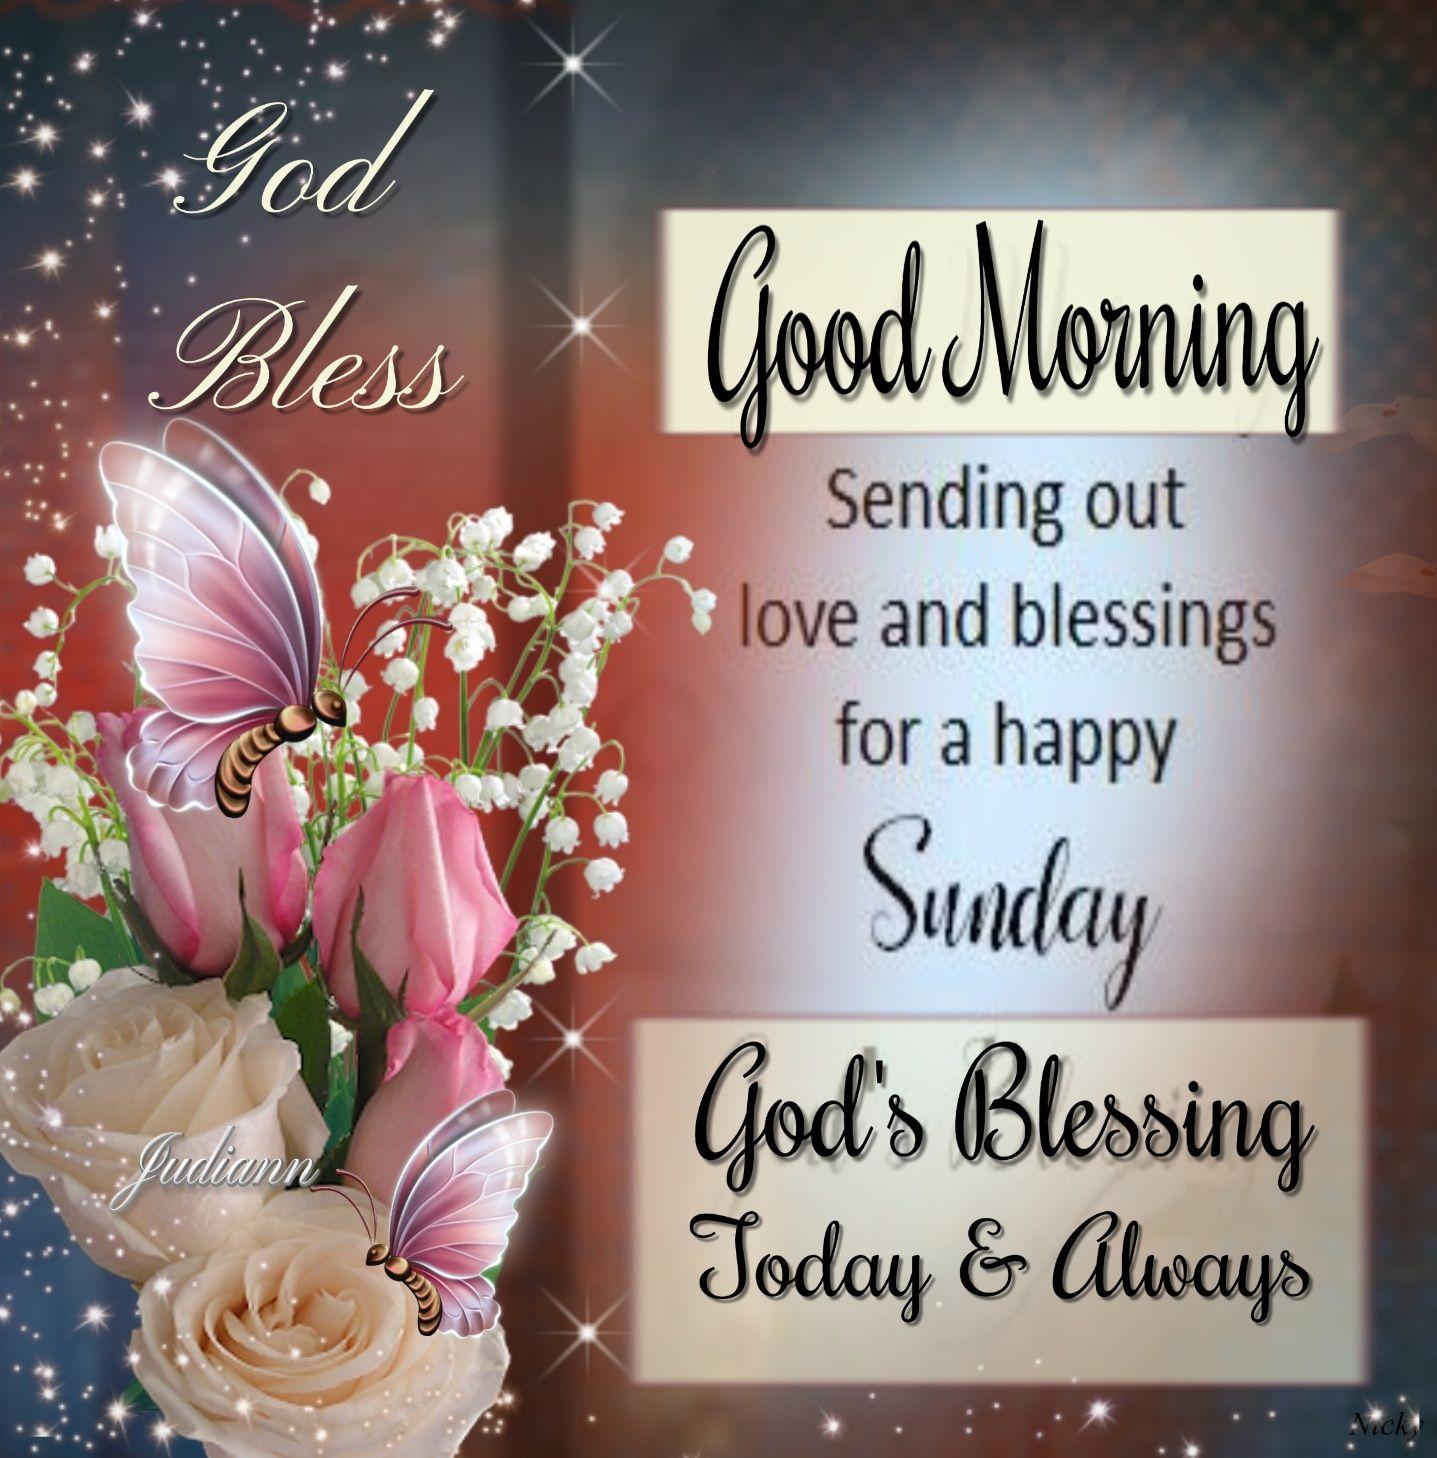 Good Morning Sunday Blessing Images Tumblr thumbnail